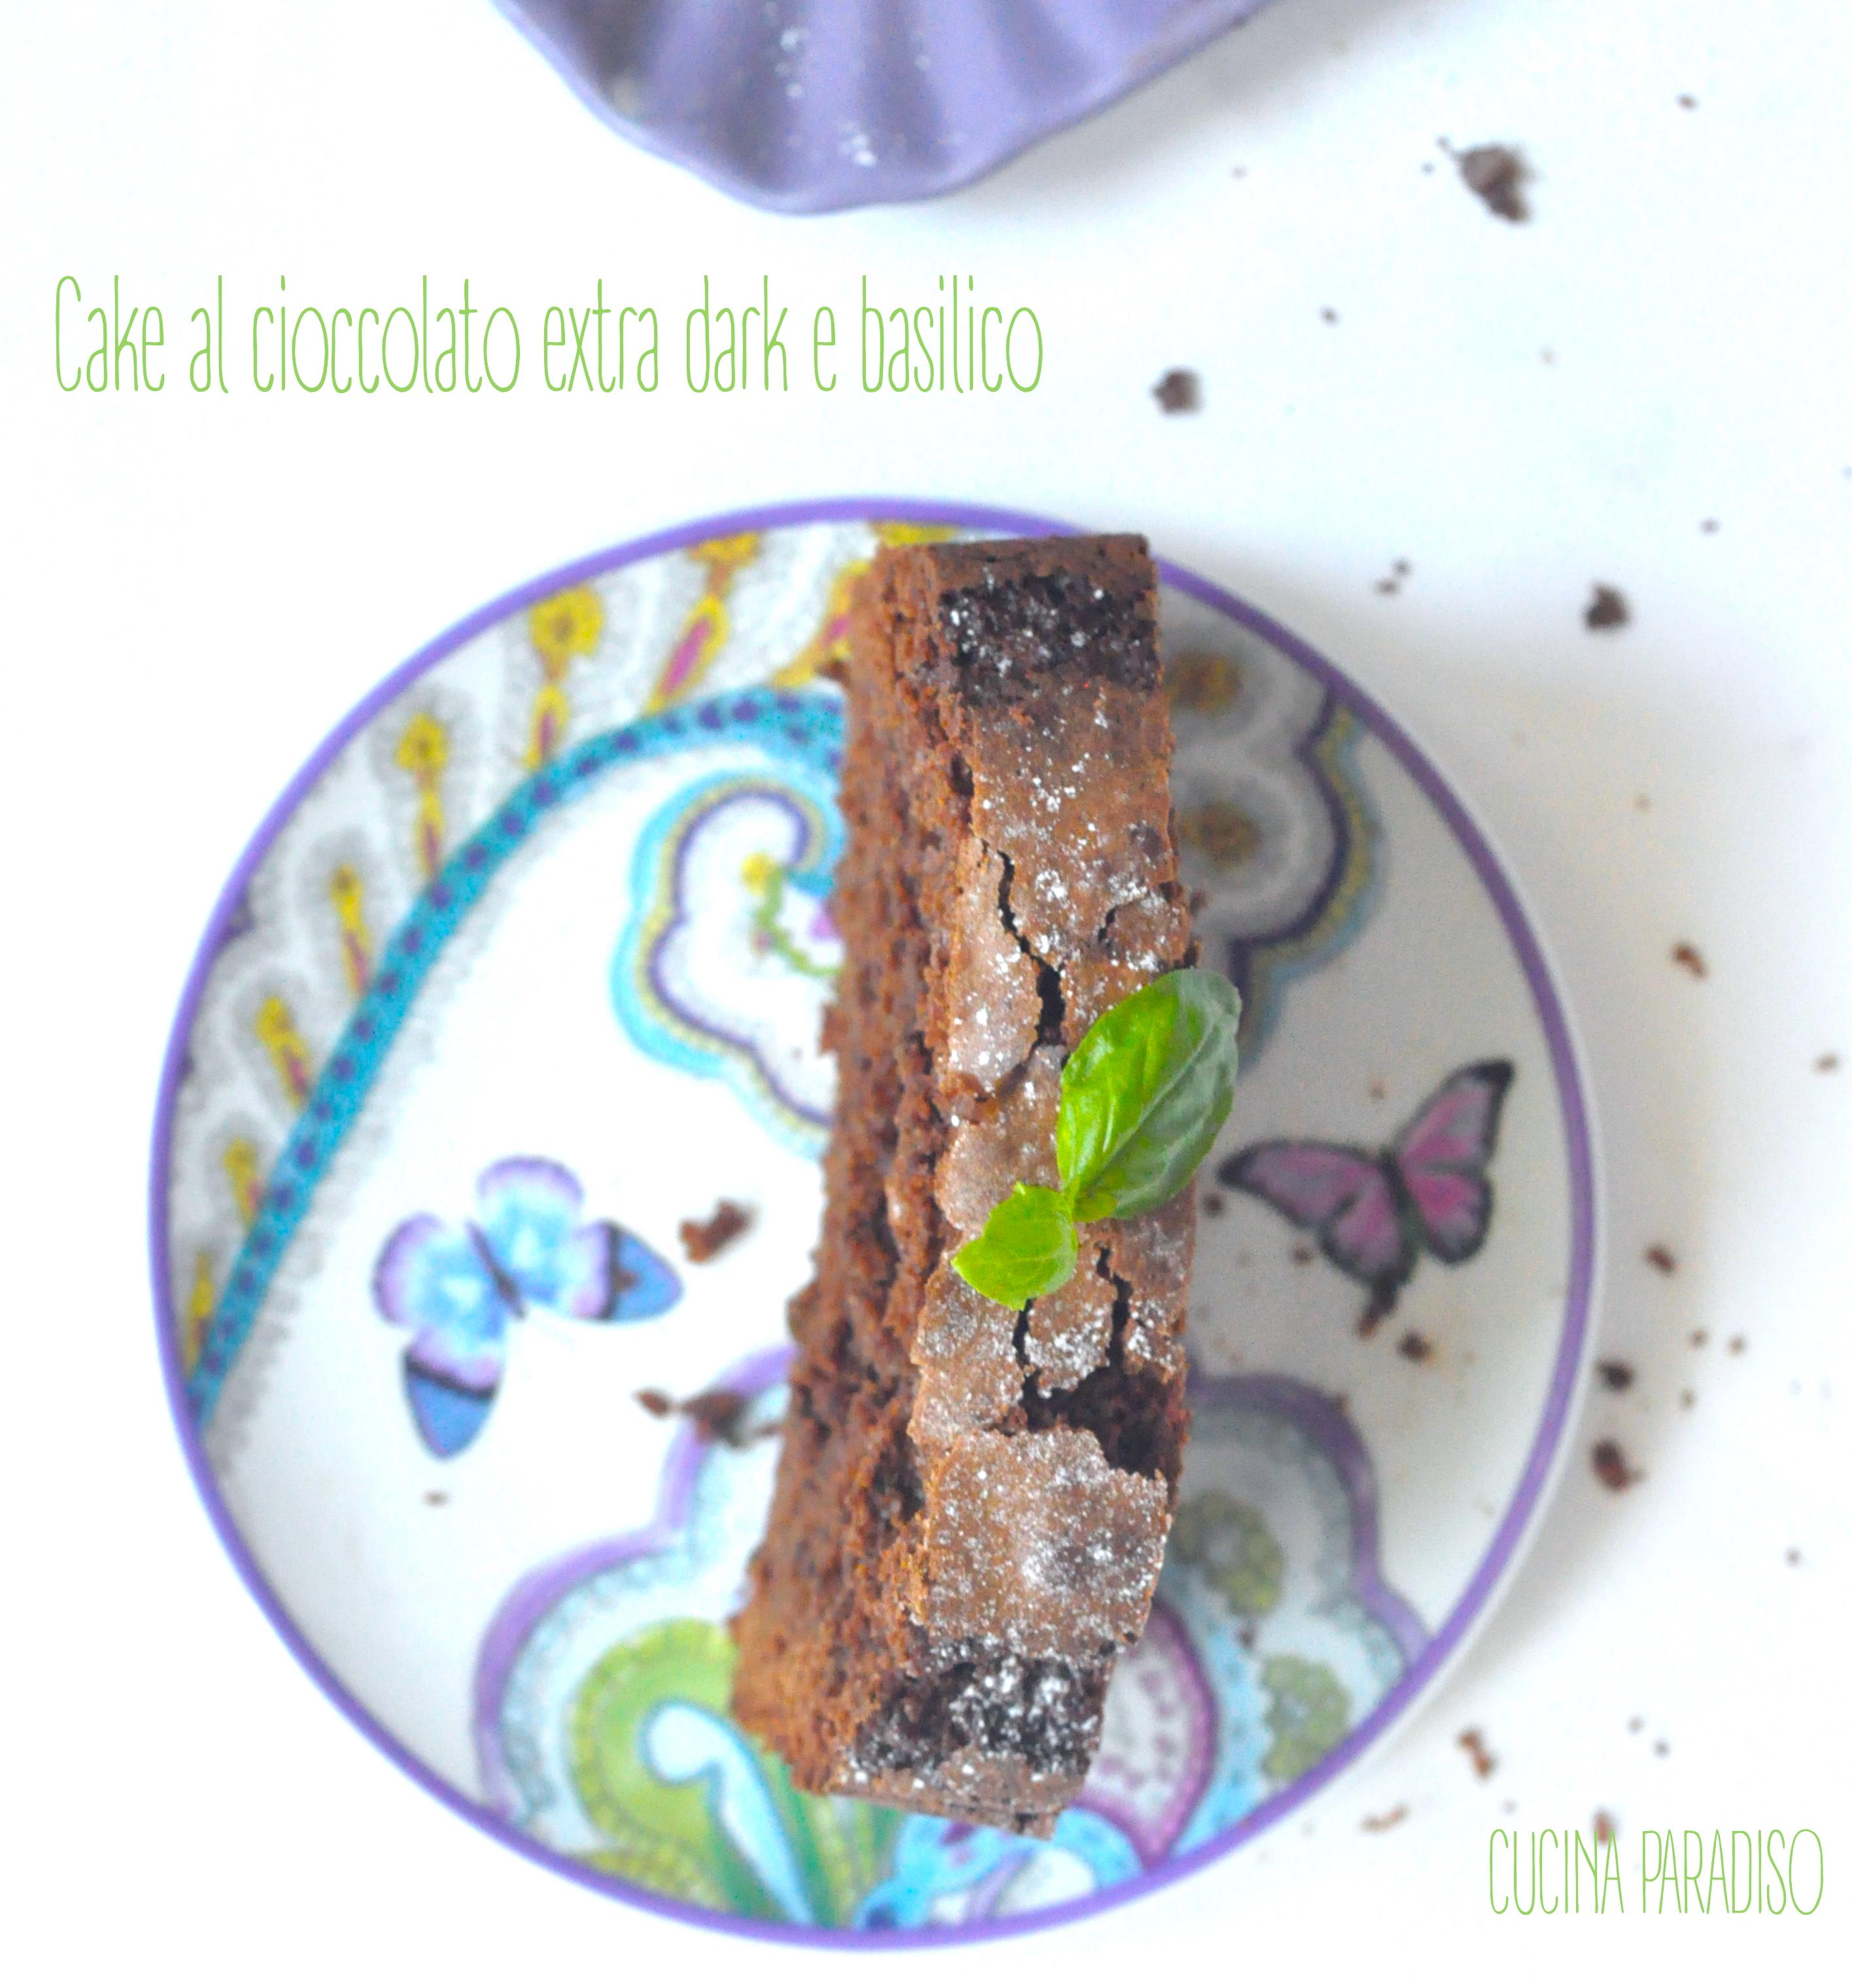 cake-al-cioccolato-extra-dark-e-basilico4